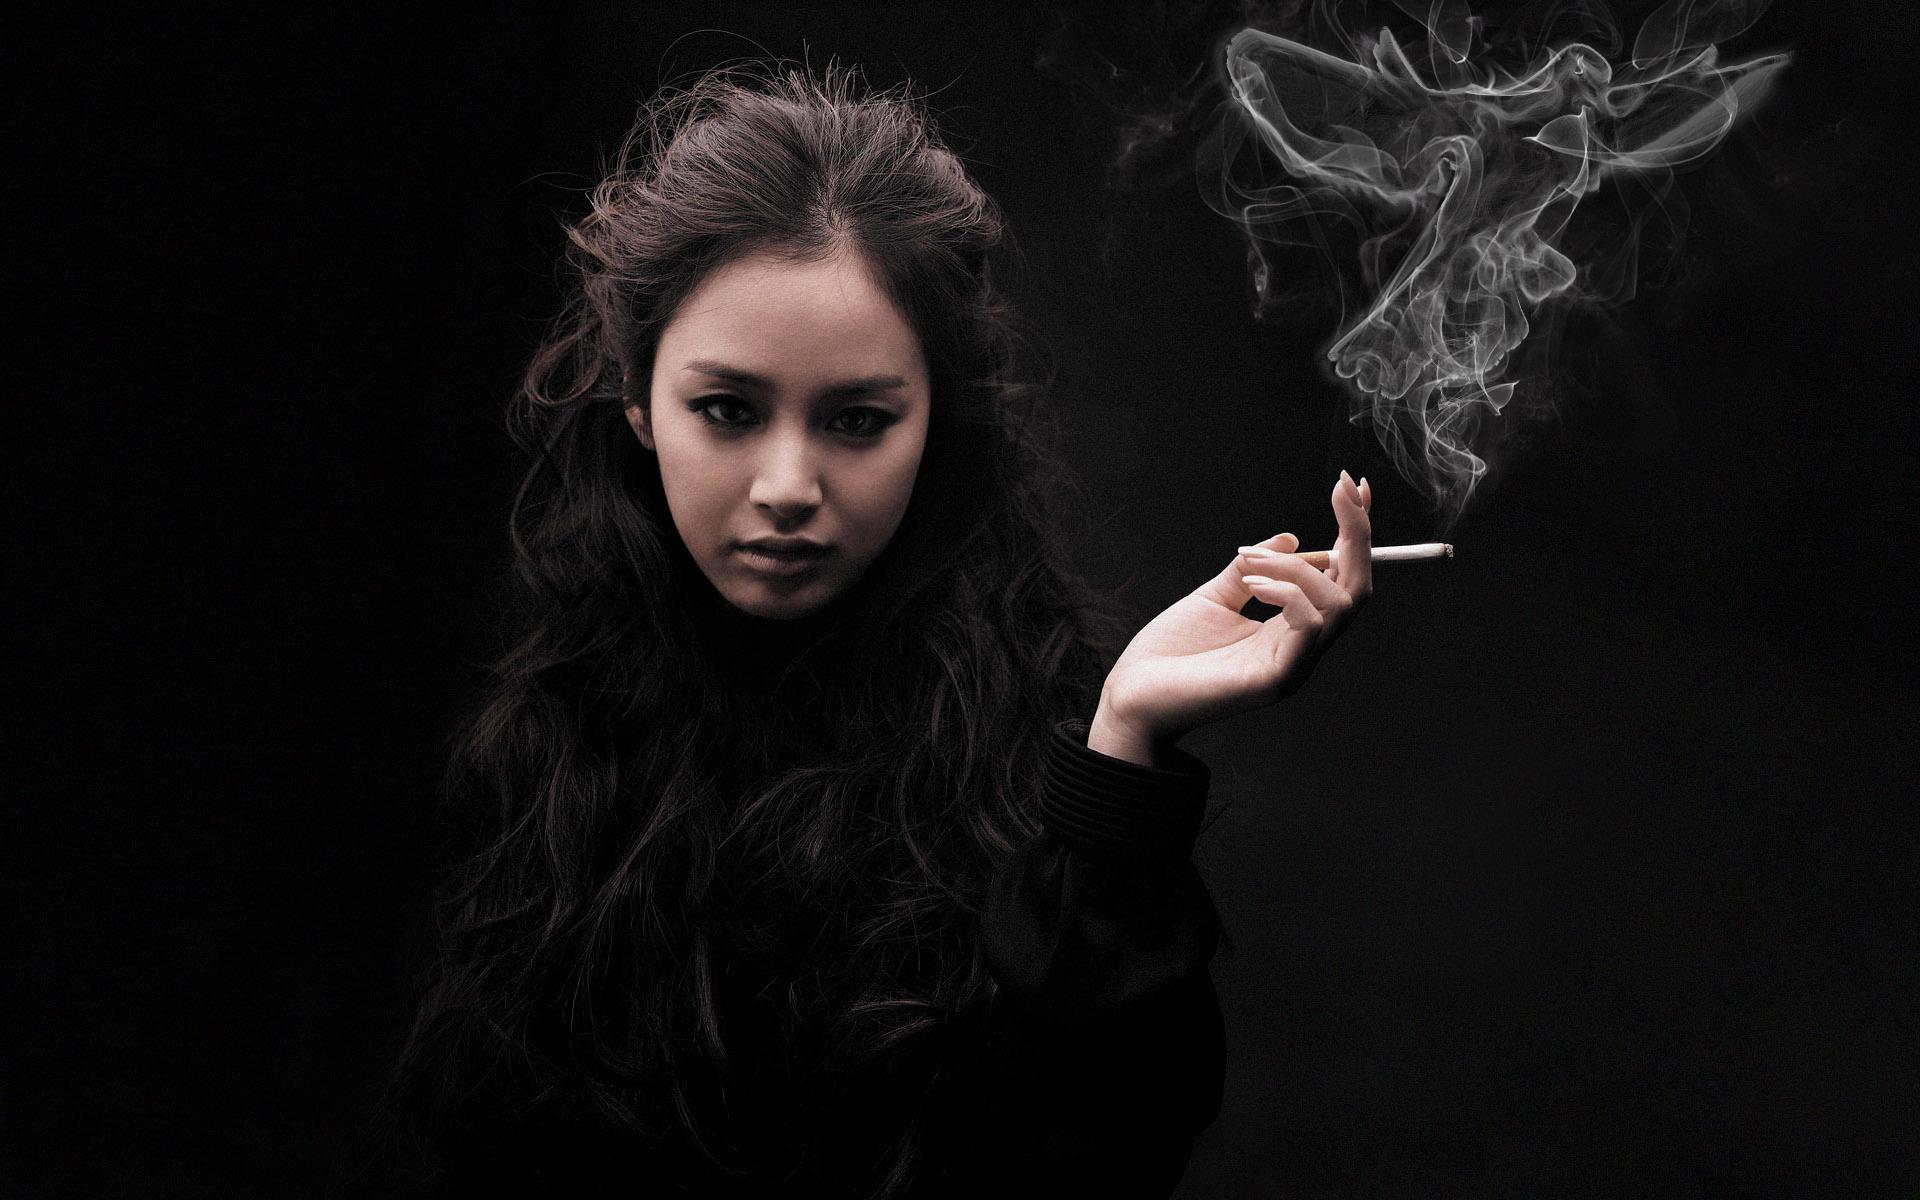 smoking_girl_by_raresssica007-d47z4n2.jpg